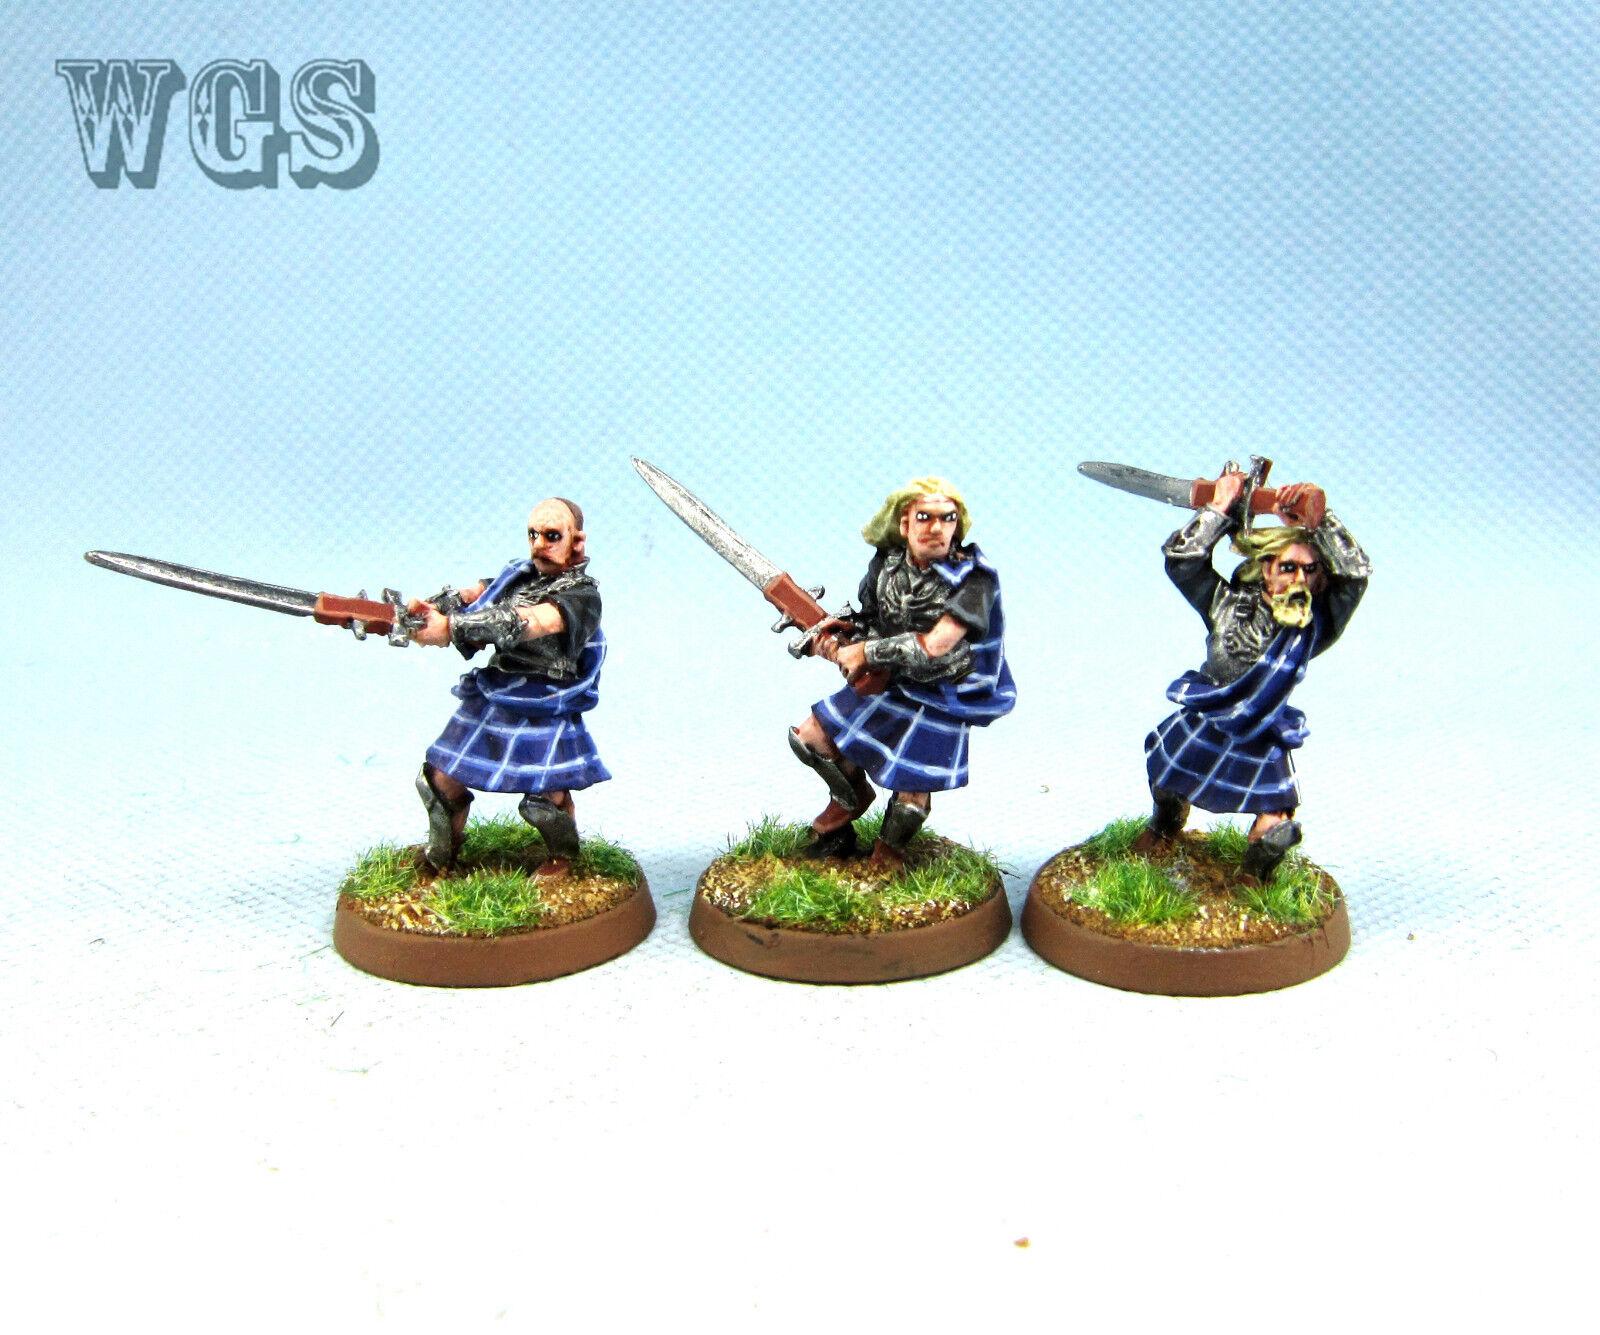 25mm Warhammer LOTR WGS painted Clansmen of Lamedon Lamedon Lamedon